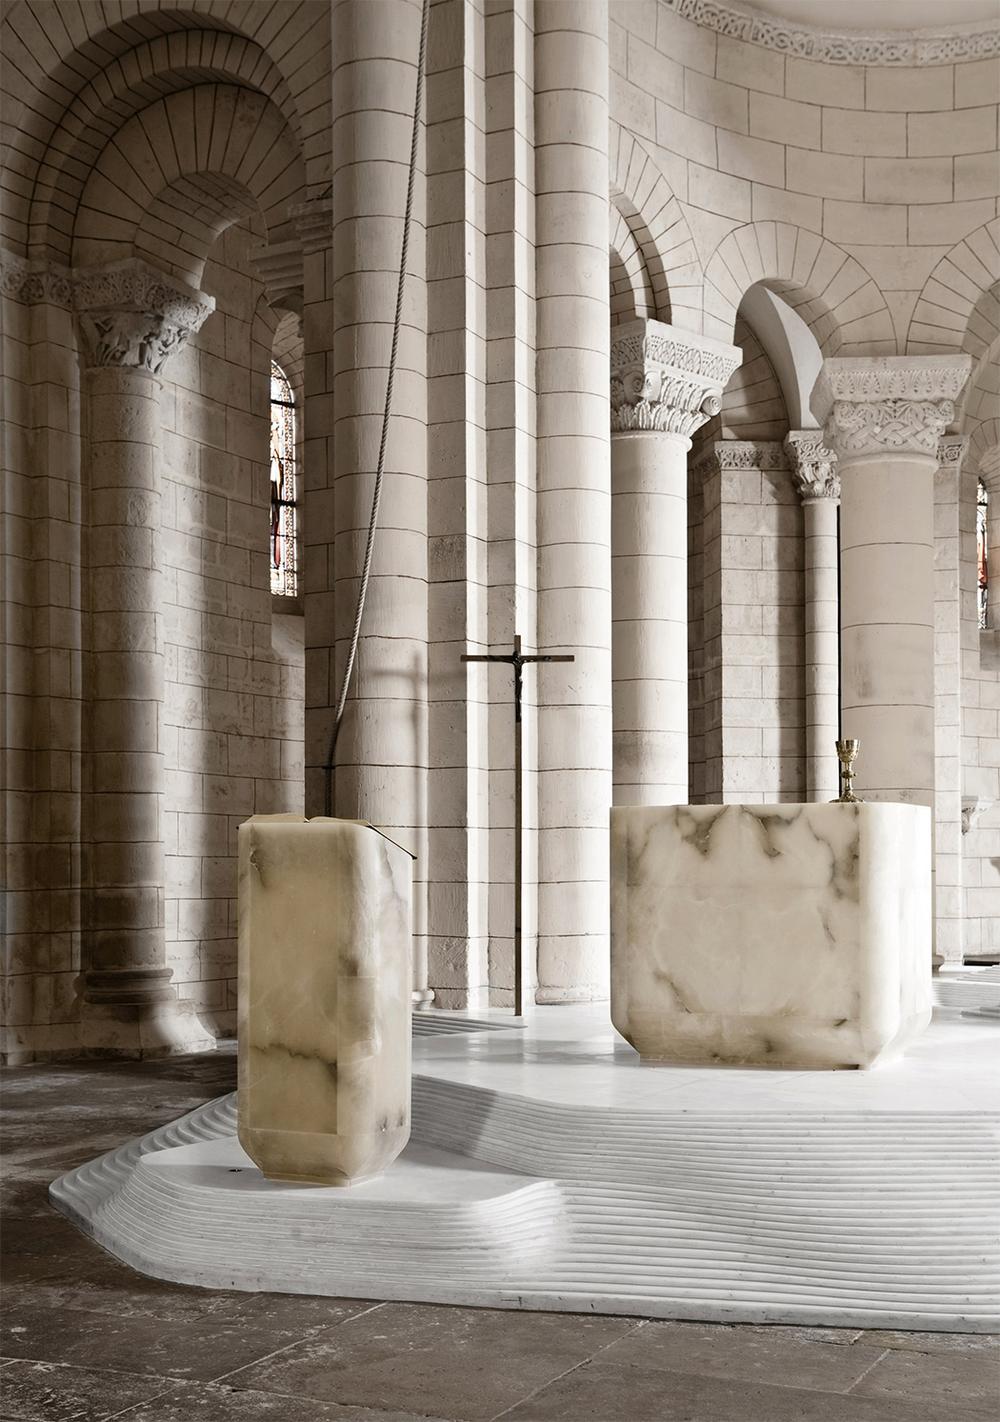 St. Hilaire church in Melle by Mathieu Lehanneur 8.png